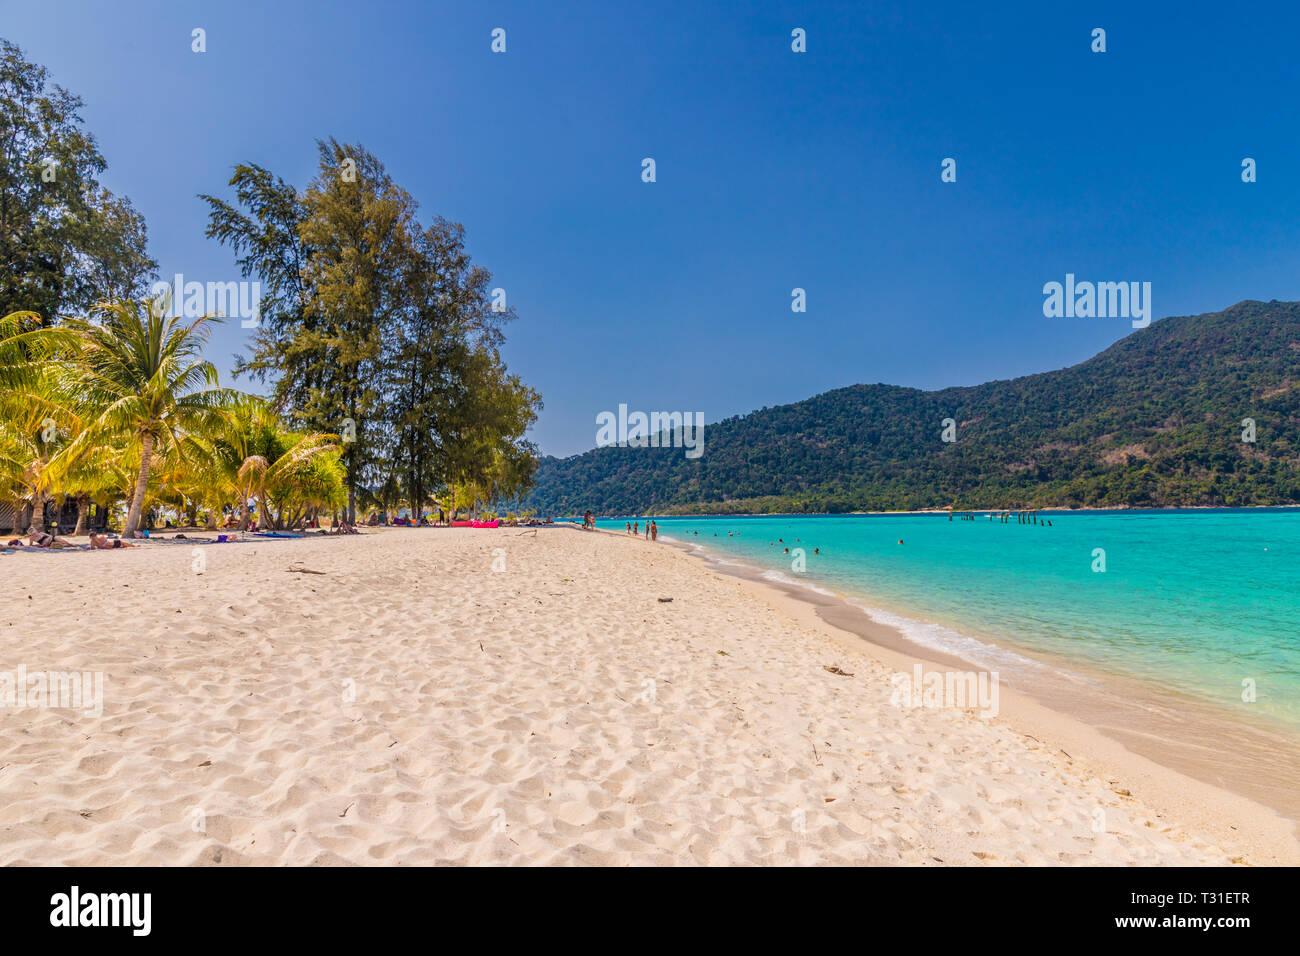 February 2019. Ko Lipe Thailand. A view of the beach in Ko Lipe in Ko tarutao national park in Thailand Stock Photo